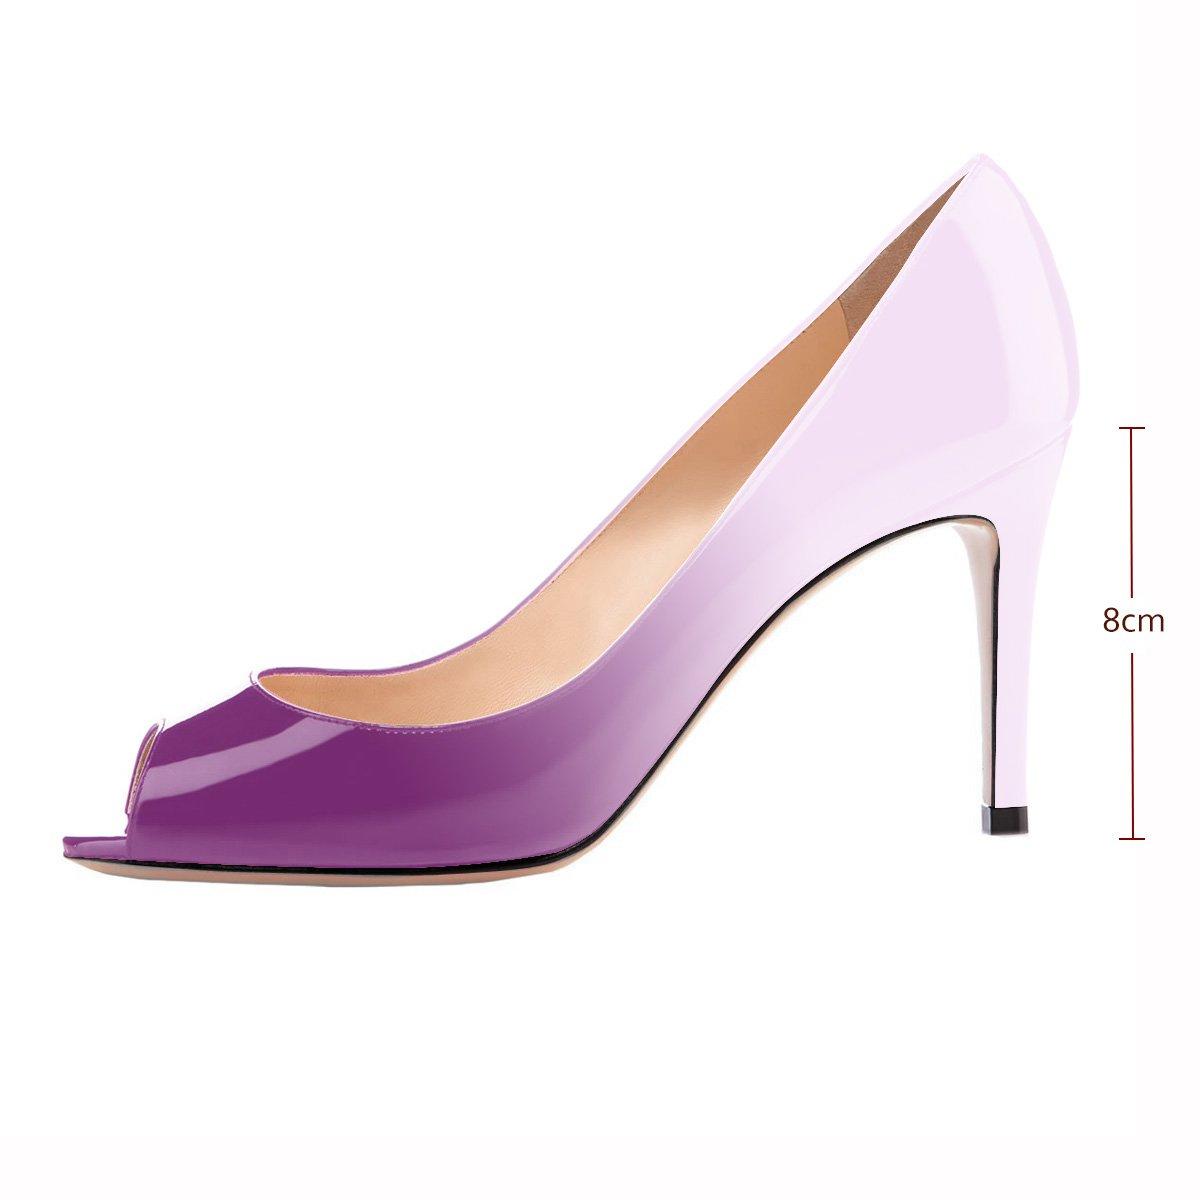 Eldof Women Peep Toe Pumps Mid-Heel Pumps Formal Wedding Bridal Classic Heel Open Toe Stiletto B07F8NNN2W 7 B(M) US|Purple-light